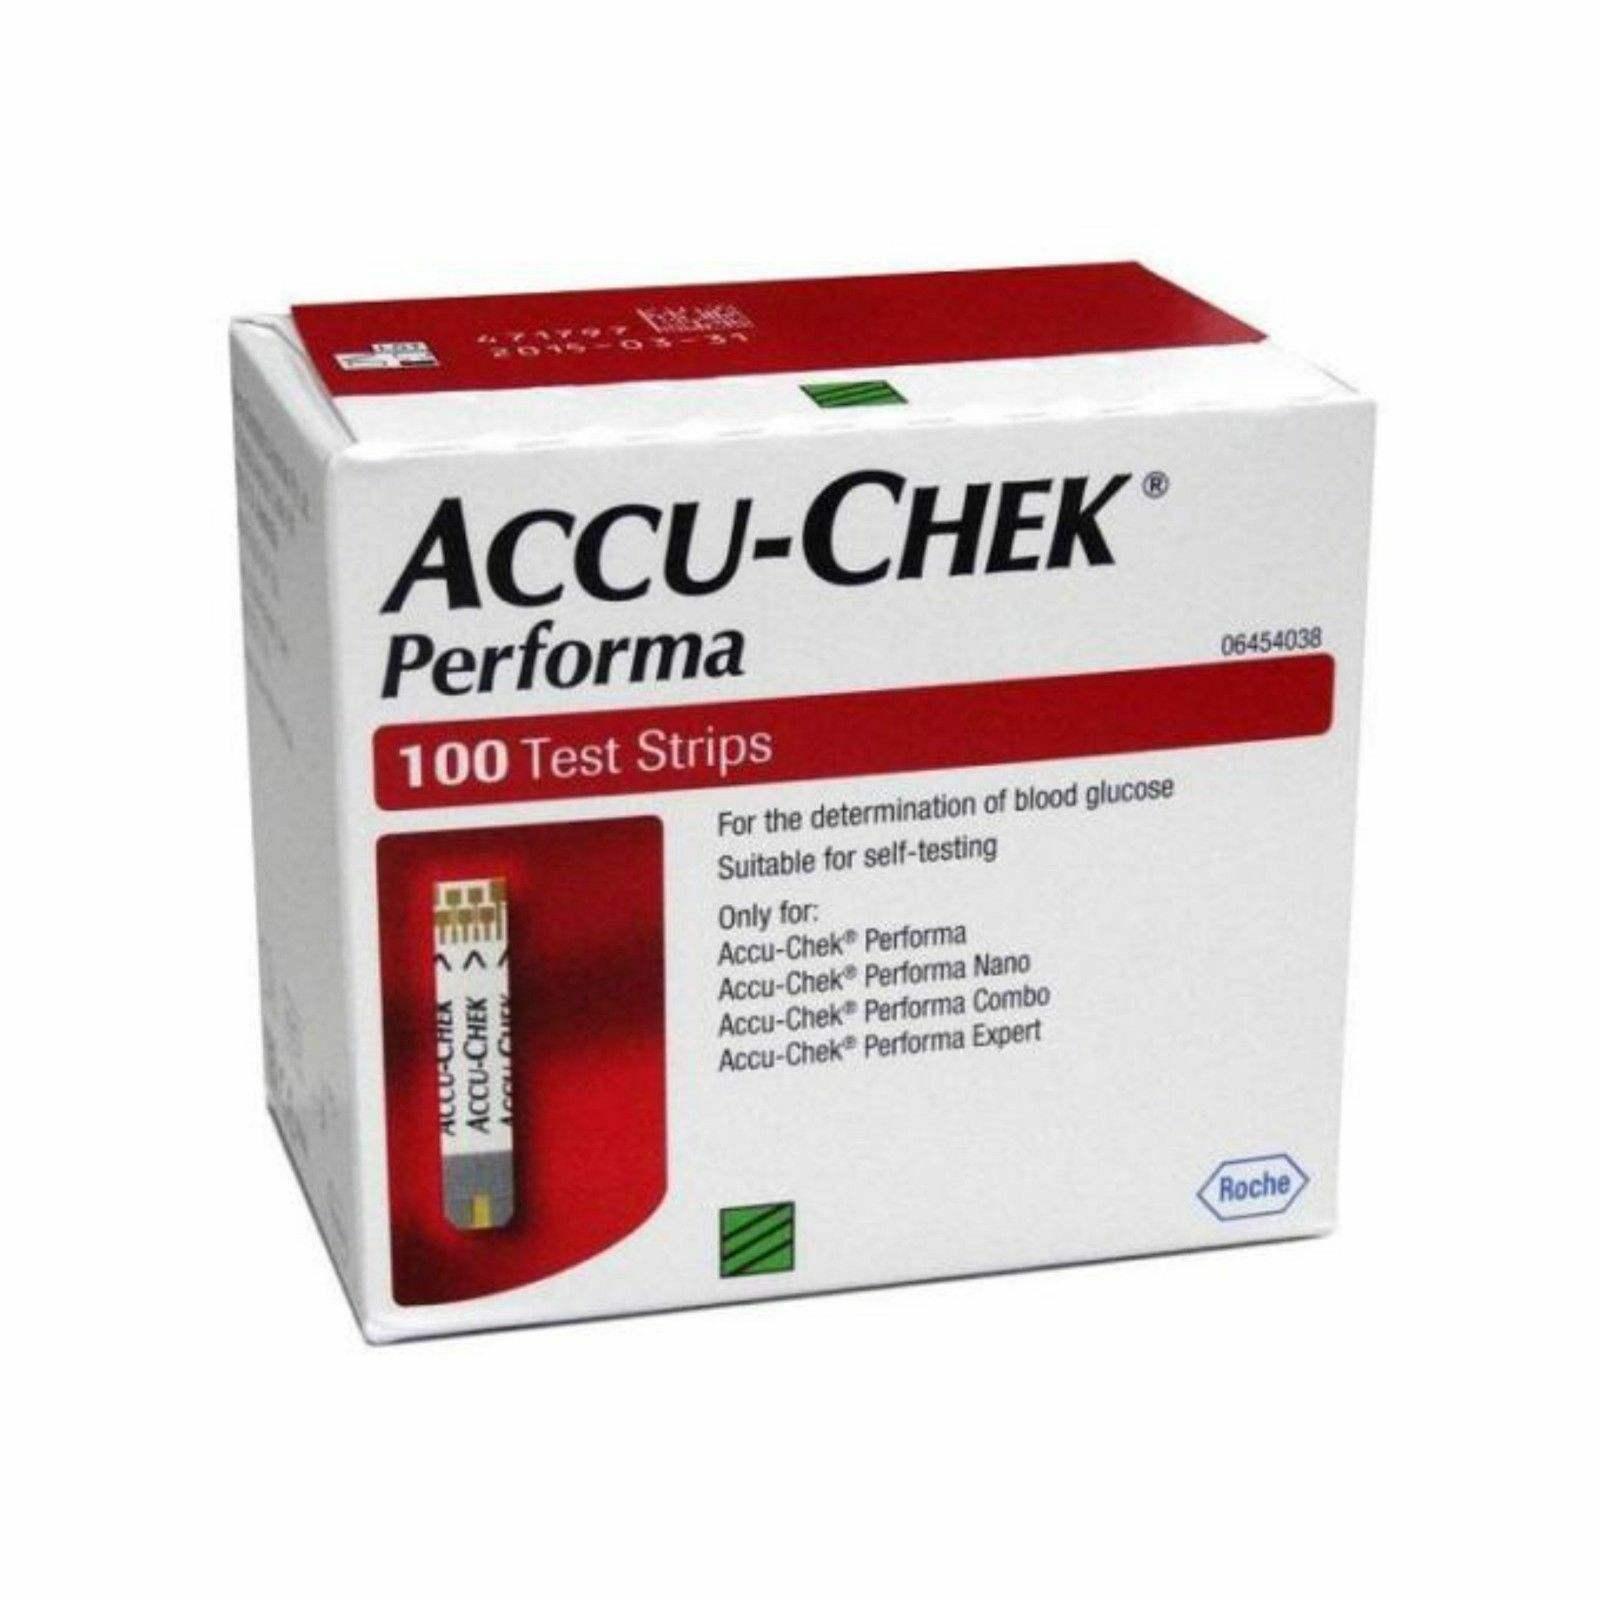 Accu Chek Diabetes Test Strips